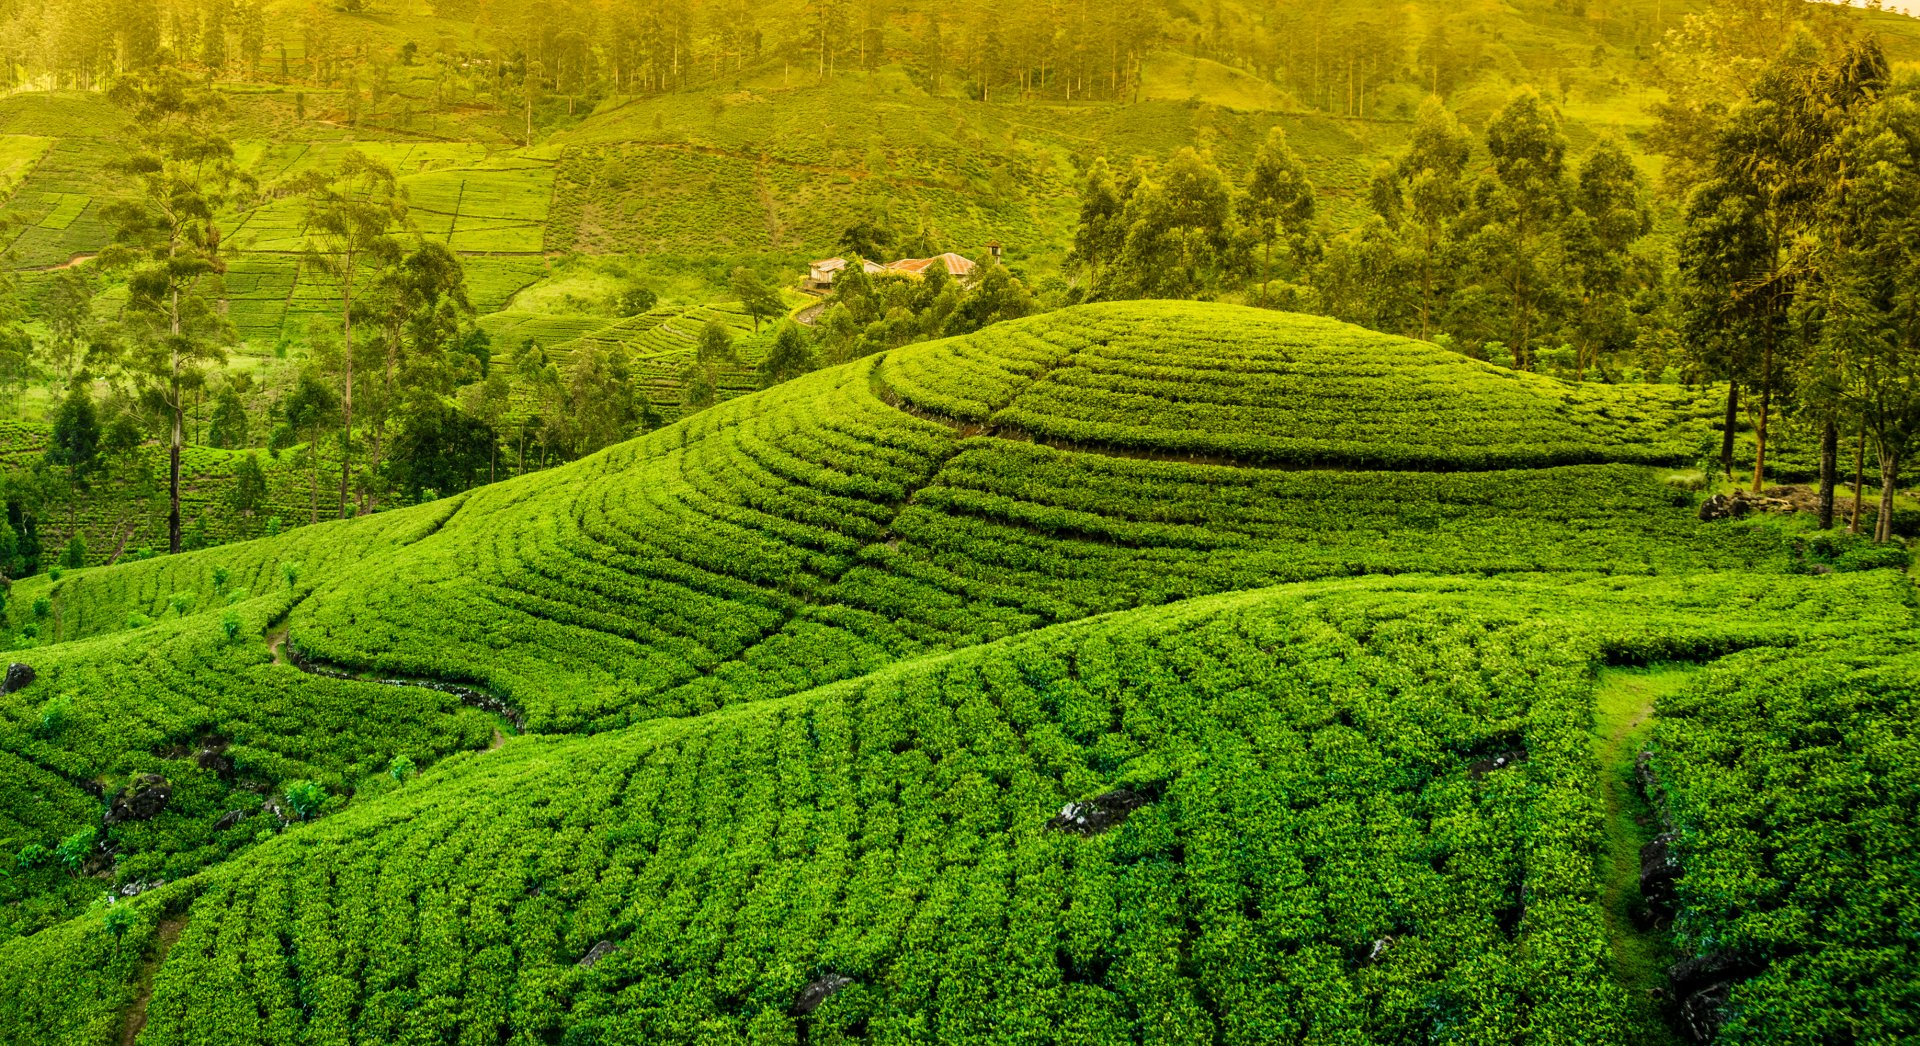 Man Made - Tea Plantation  Green Hill Landscape Wallpaper